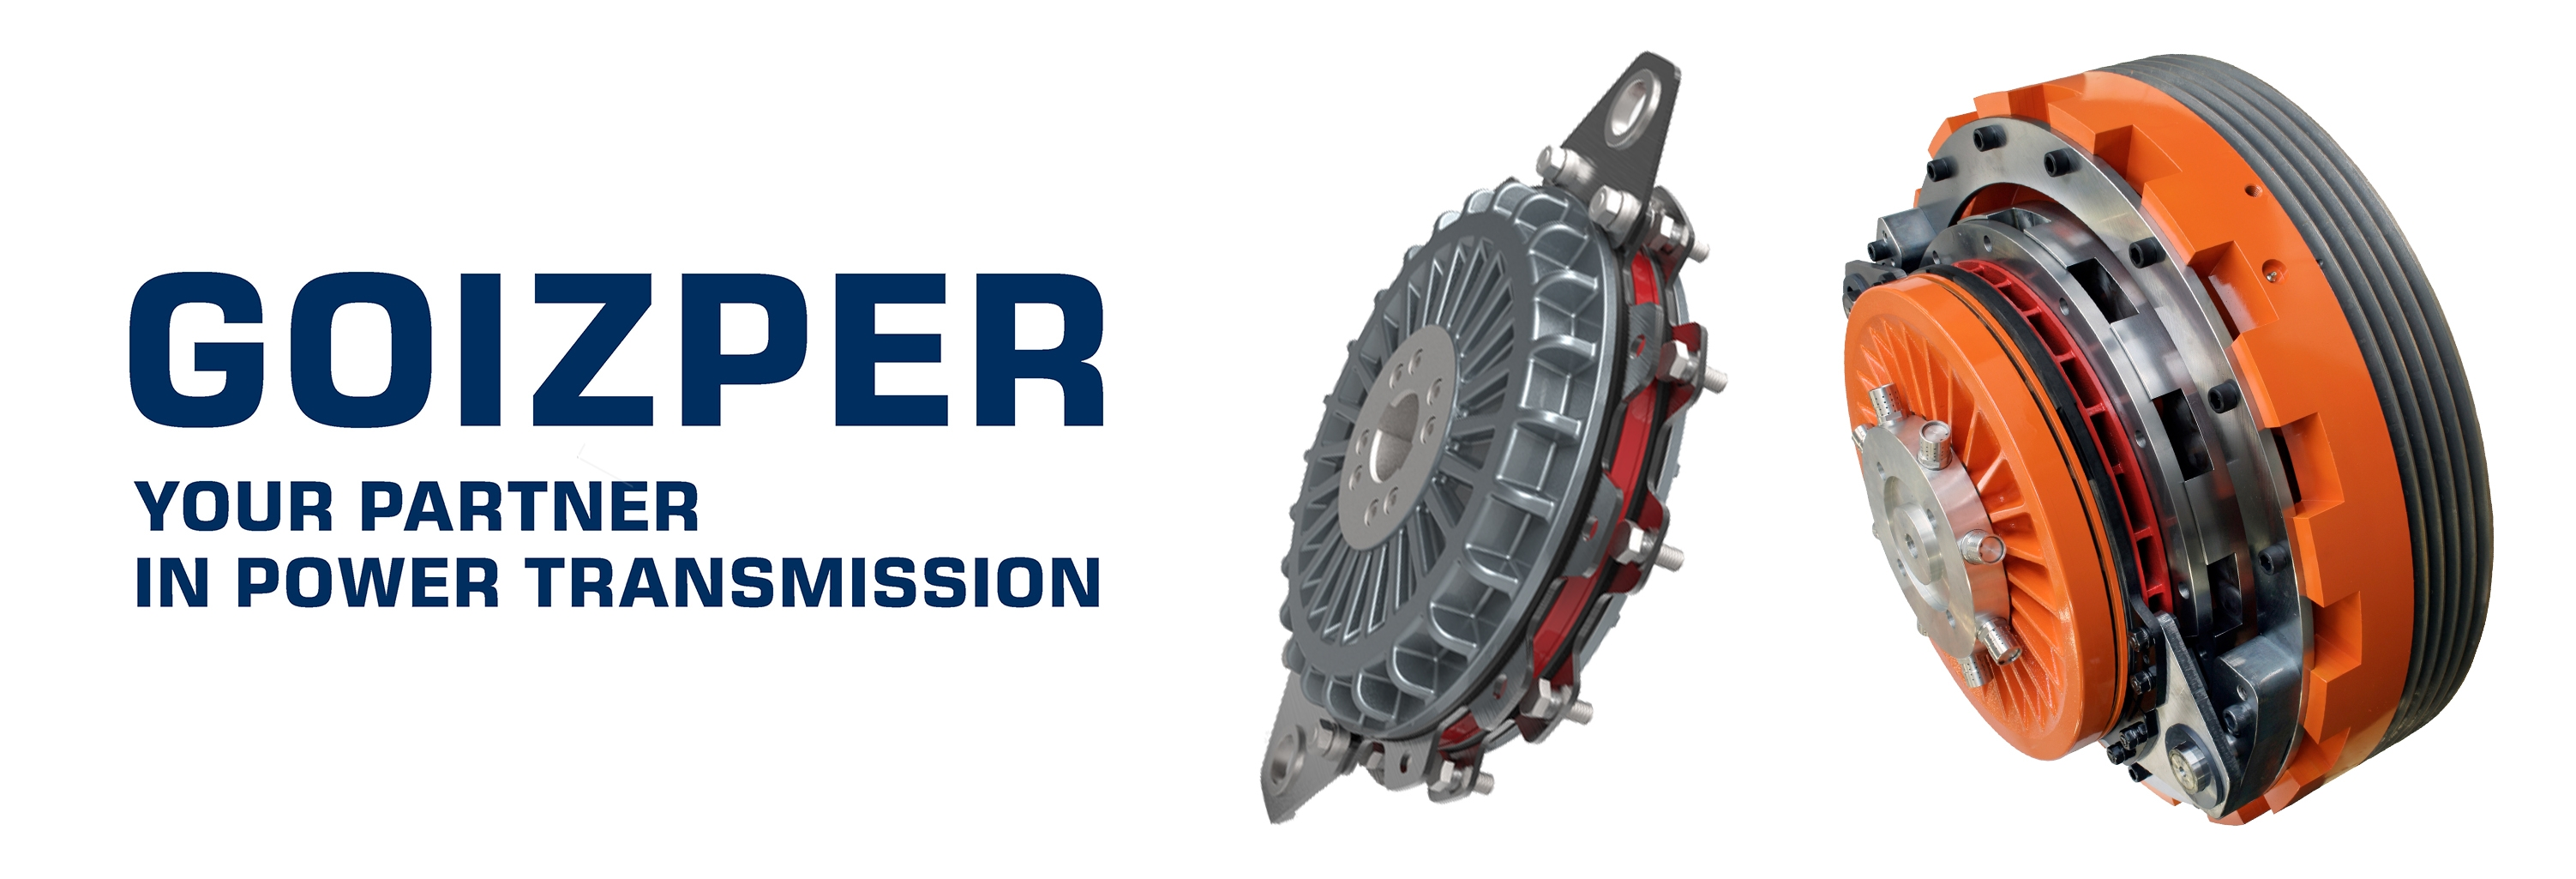 Goizper Industrial Group